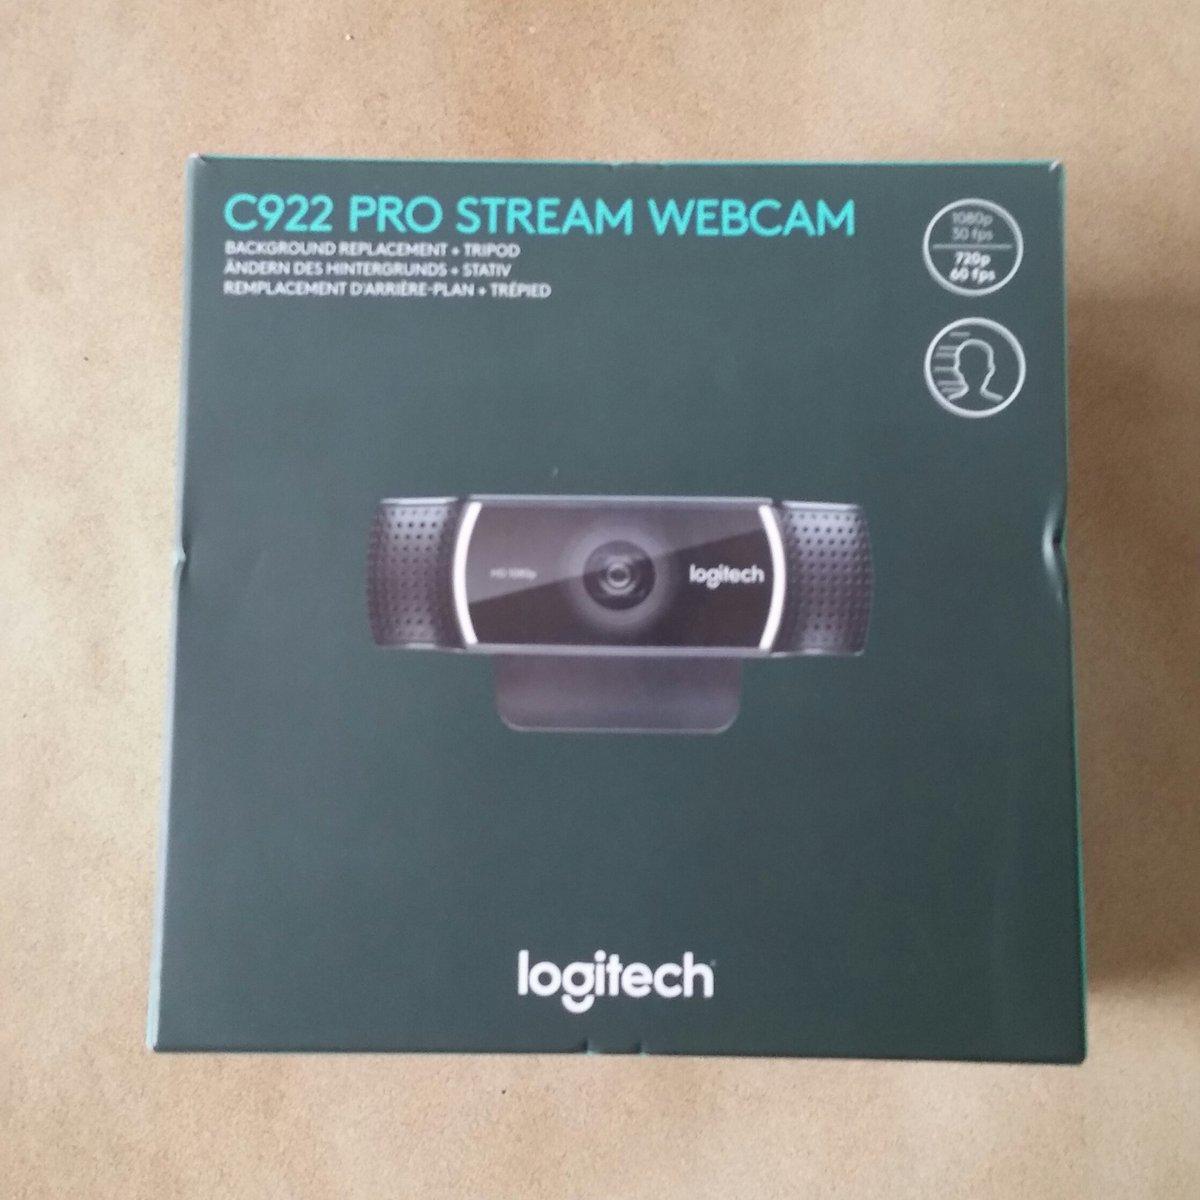 c922prostreamwebcam hashtag on Twitter